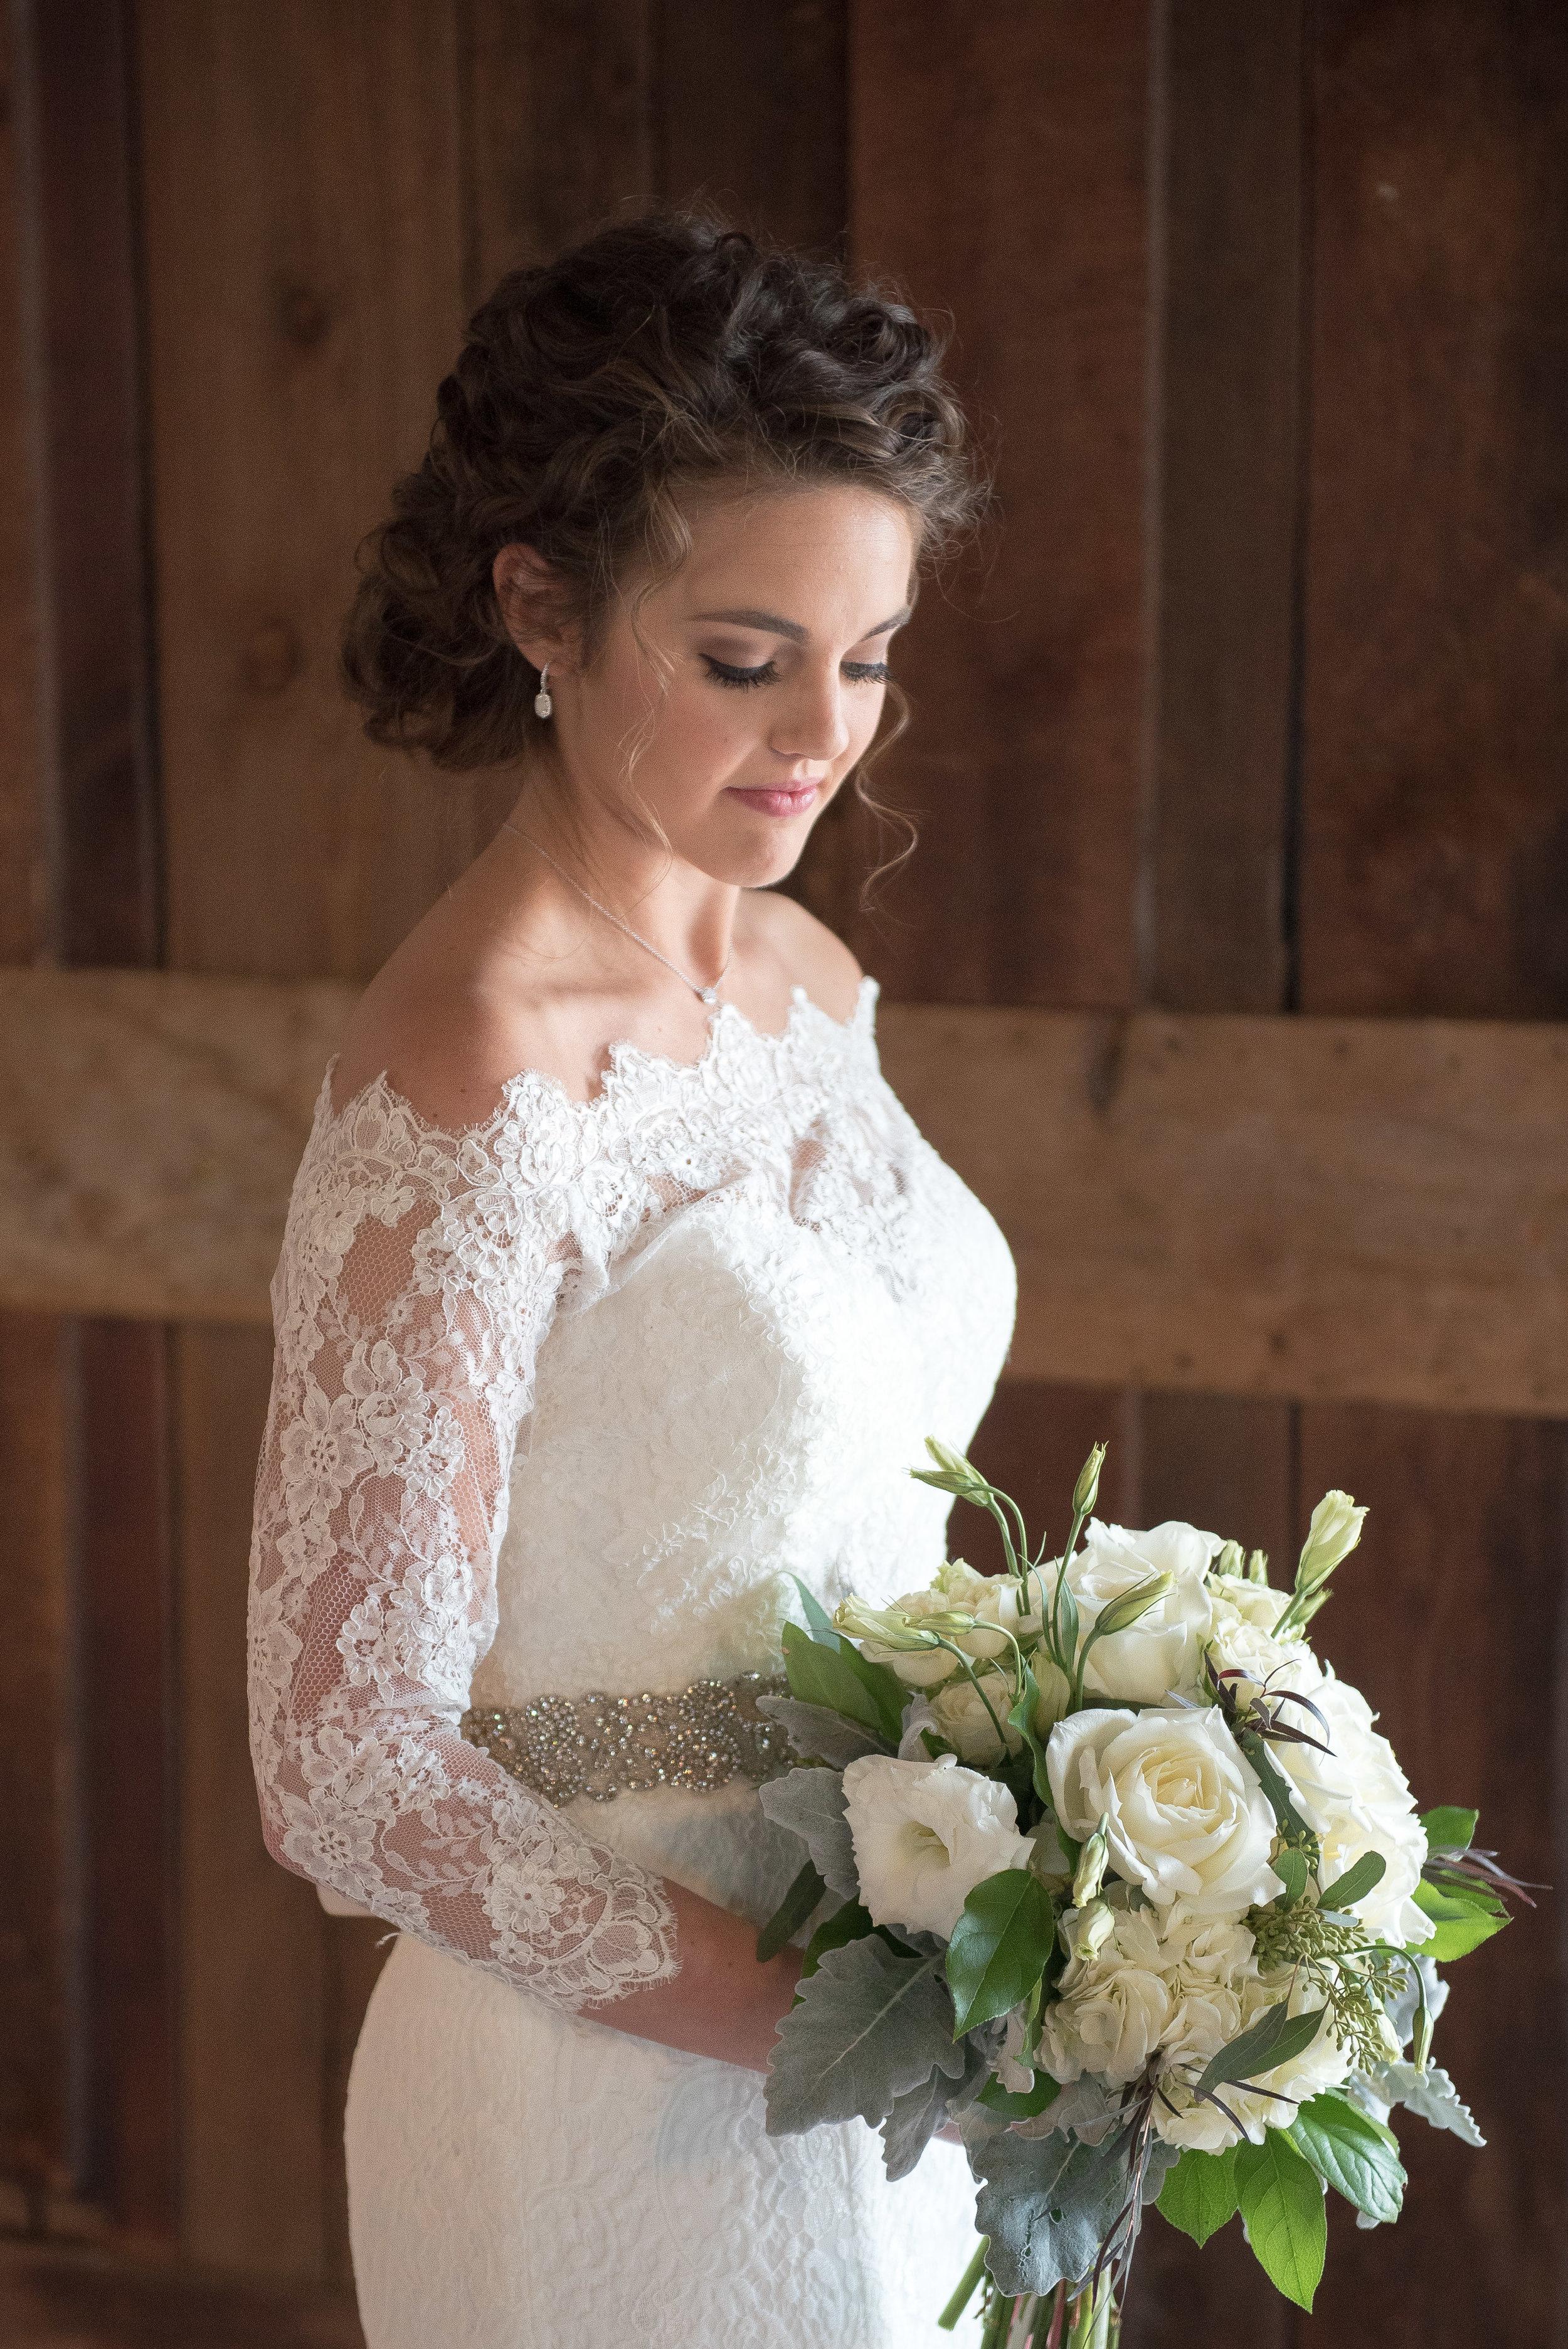 The Roller Mill Events - Winston Salem Weddings - NC Weddings - High Point NC Weddings - Winston Salem Venue - Yasmin Leonard Photography-24.jpg